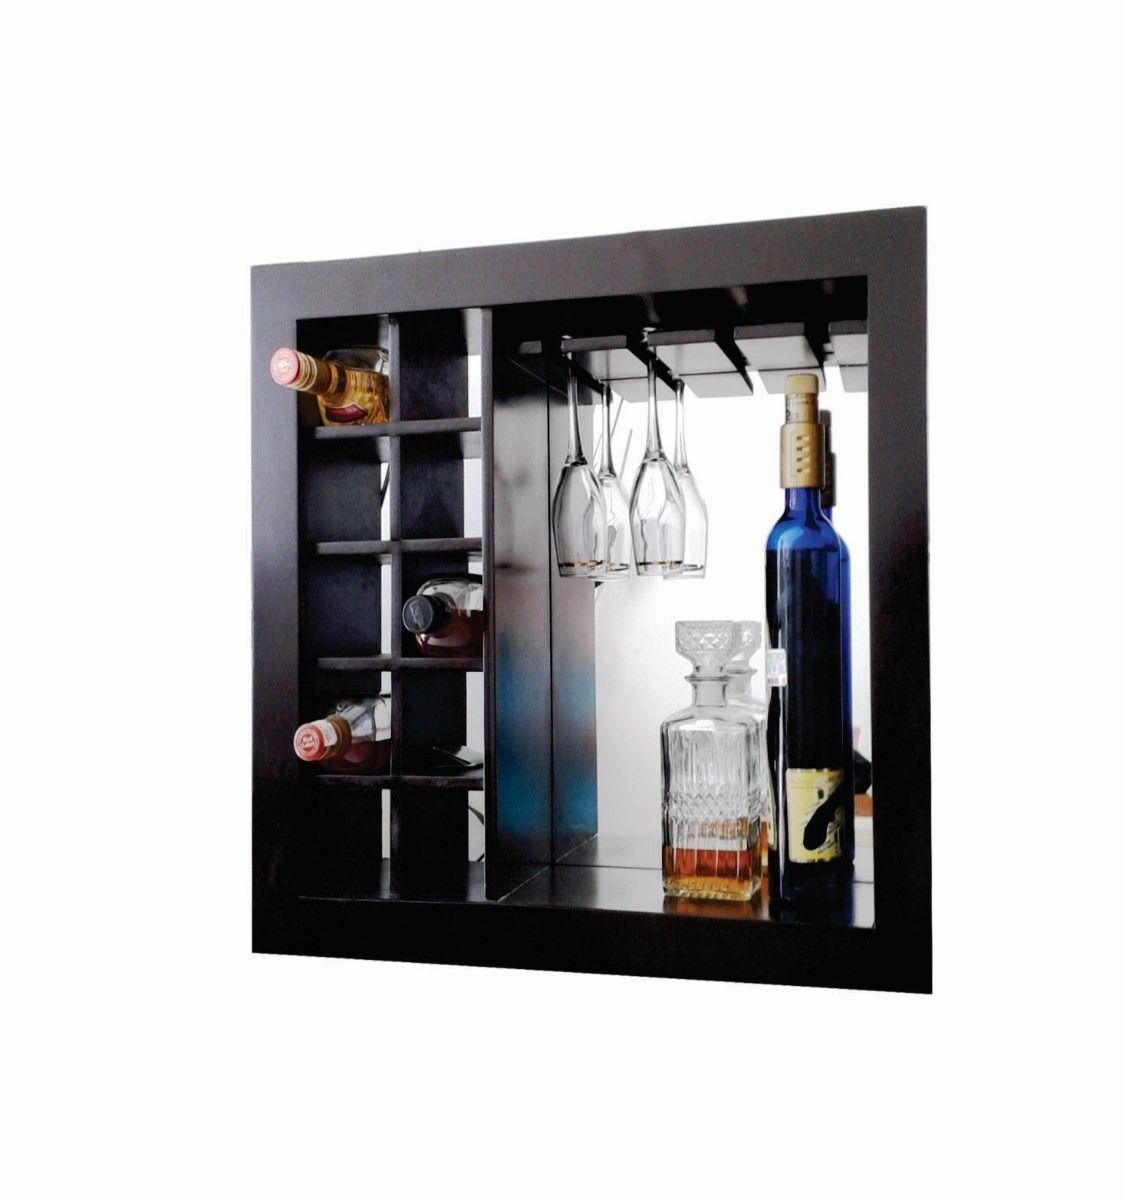 Cava cantina mueble contemporane para vinos copas de for Mueble para botellas